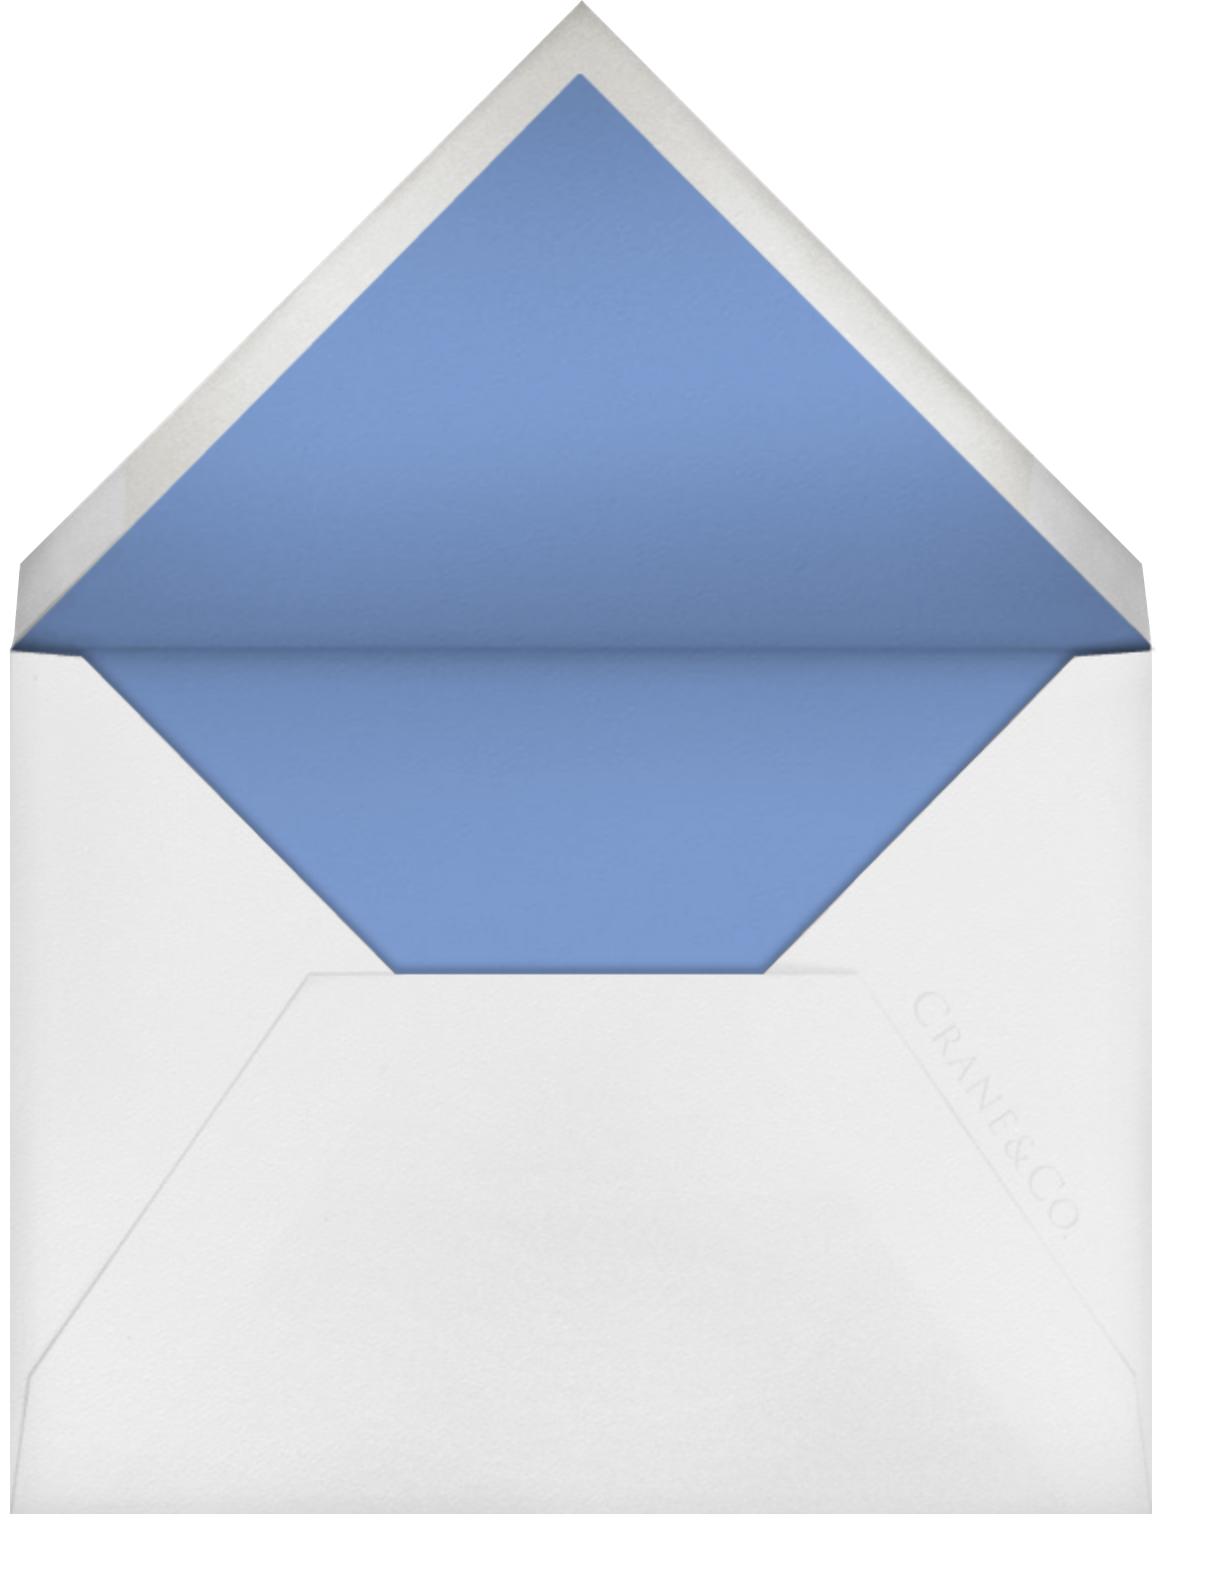 June - Pearl White (Newport Blue) - Paperless Post - Adult birthday - envelope back